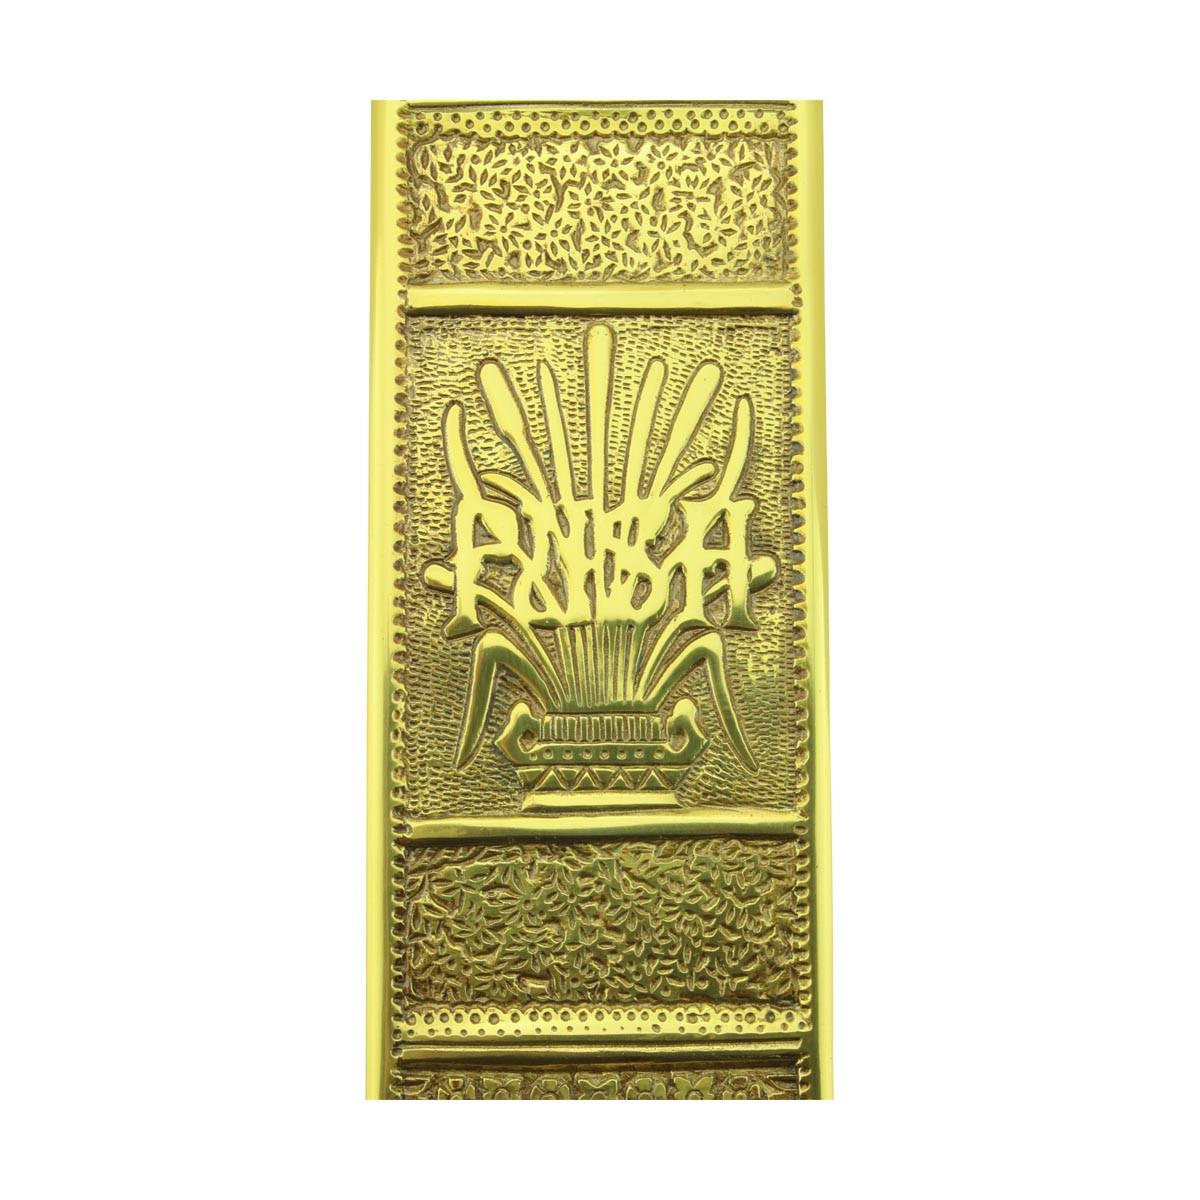 Baroque Door Push Plate Cast Brass 11 12 H Push Plate Push Plates Door Push Plate